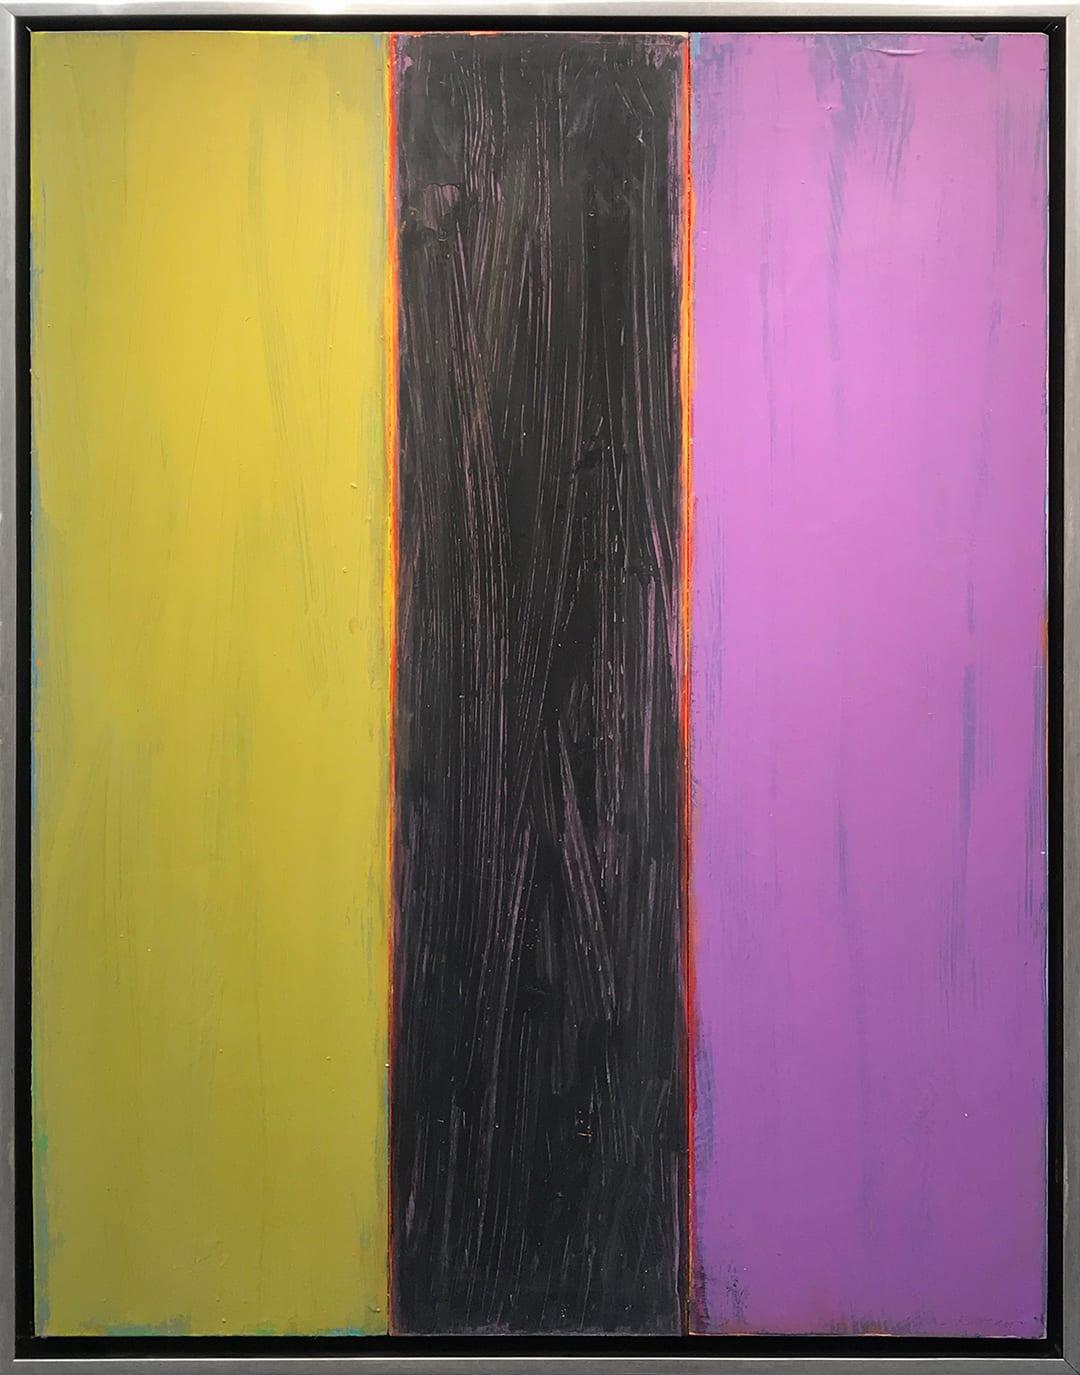 David Rothermel SLICE Acrylic on Wood panel 48 x 38 in 121.9 x 96.5 cm